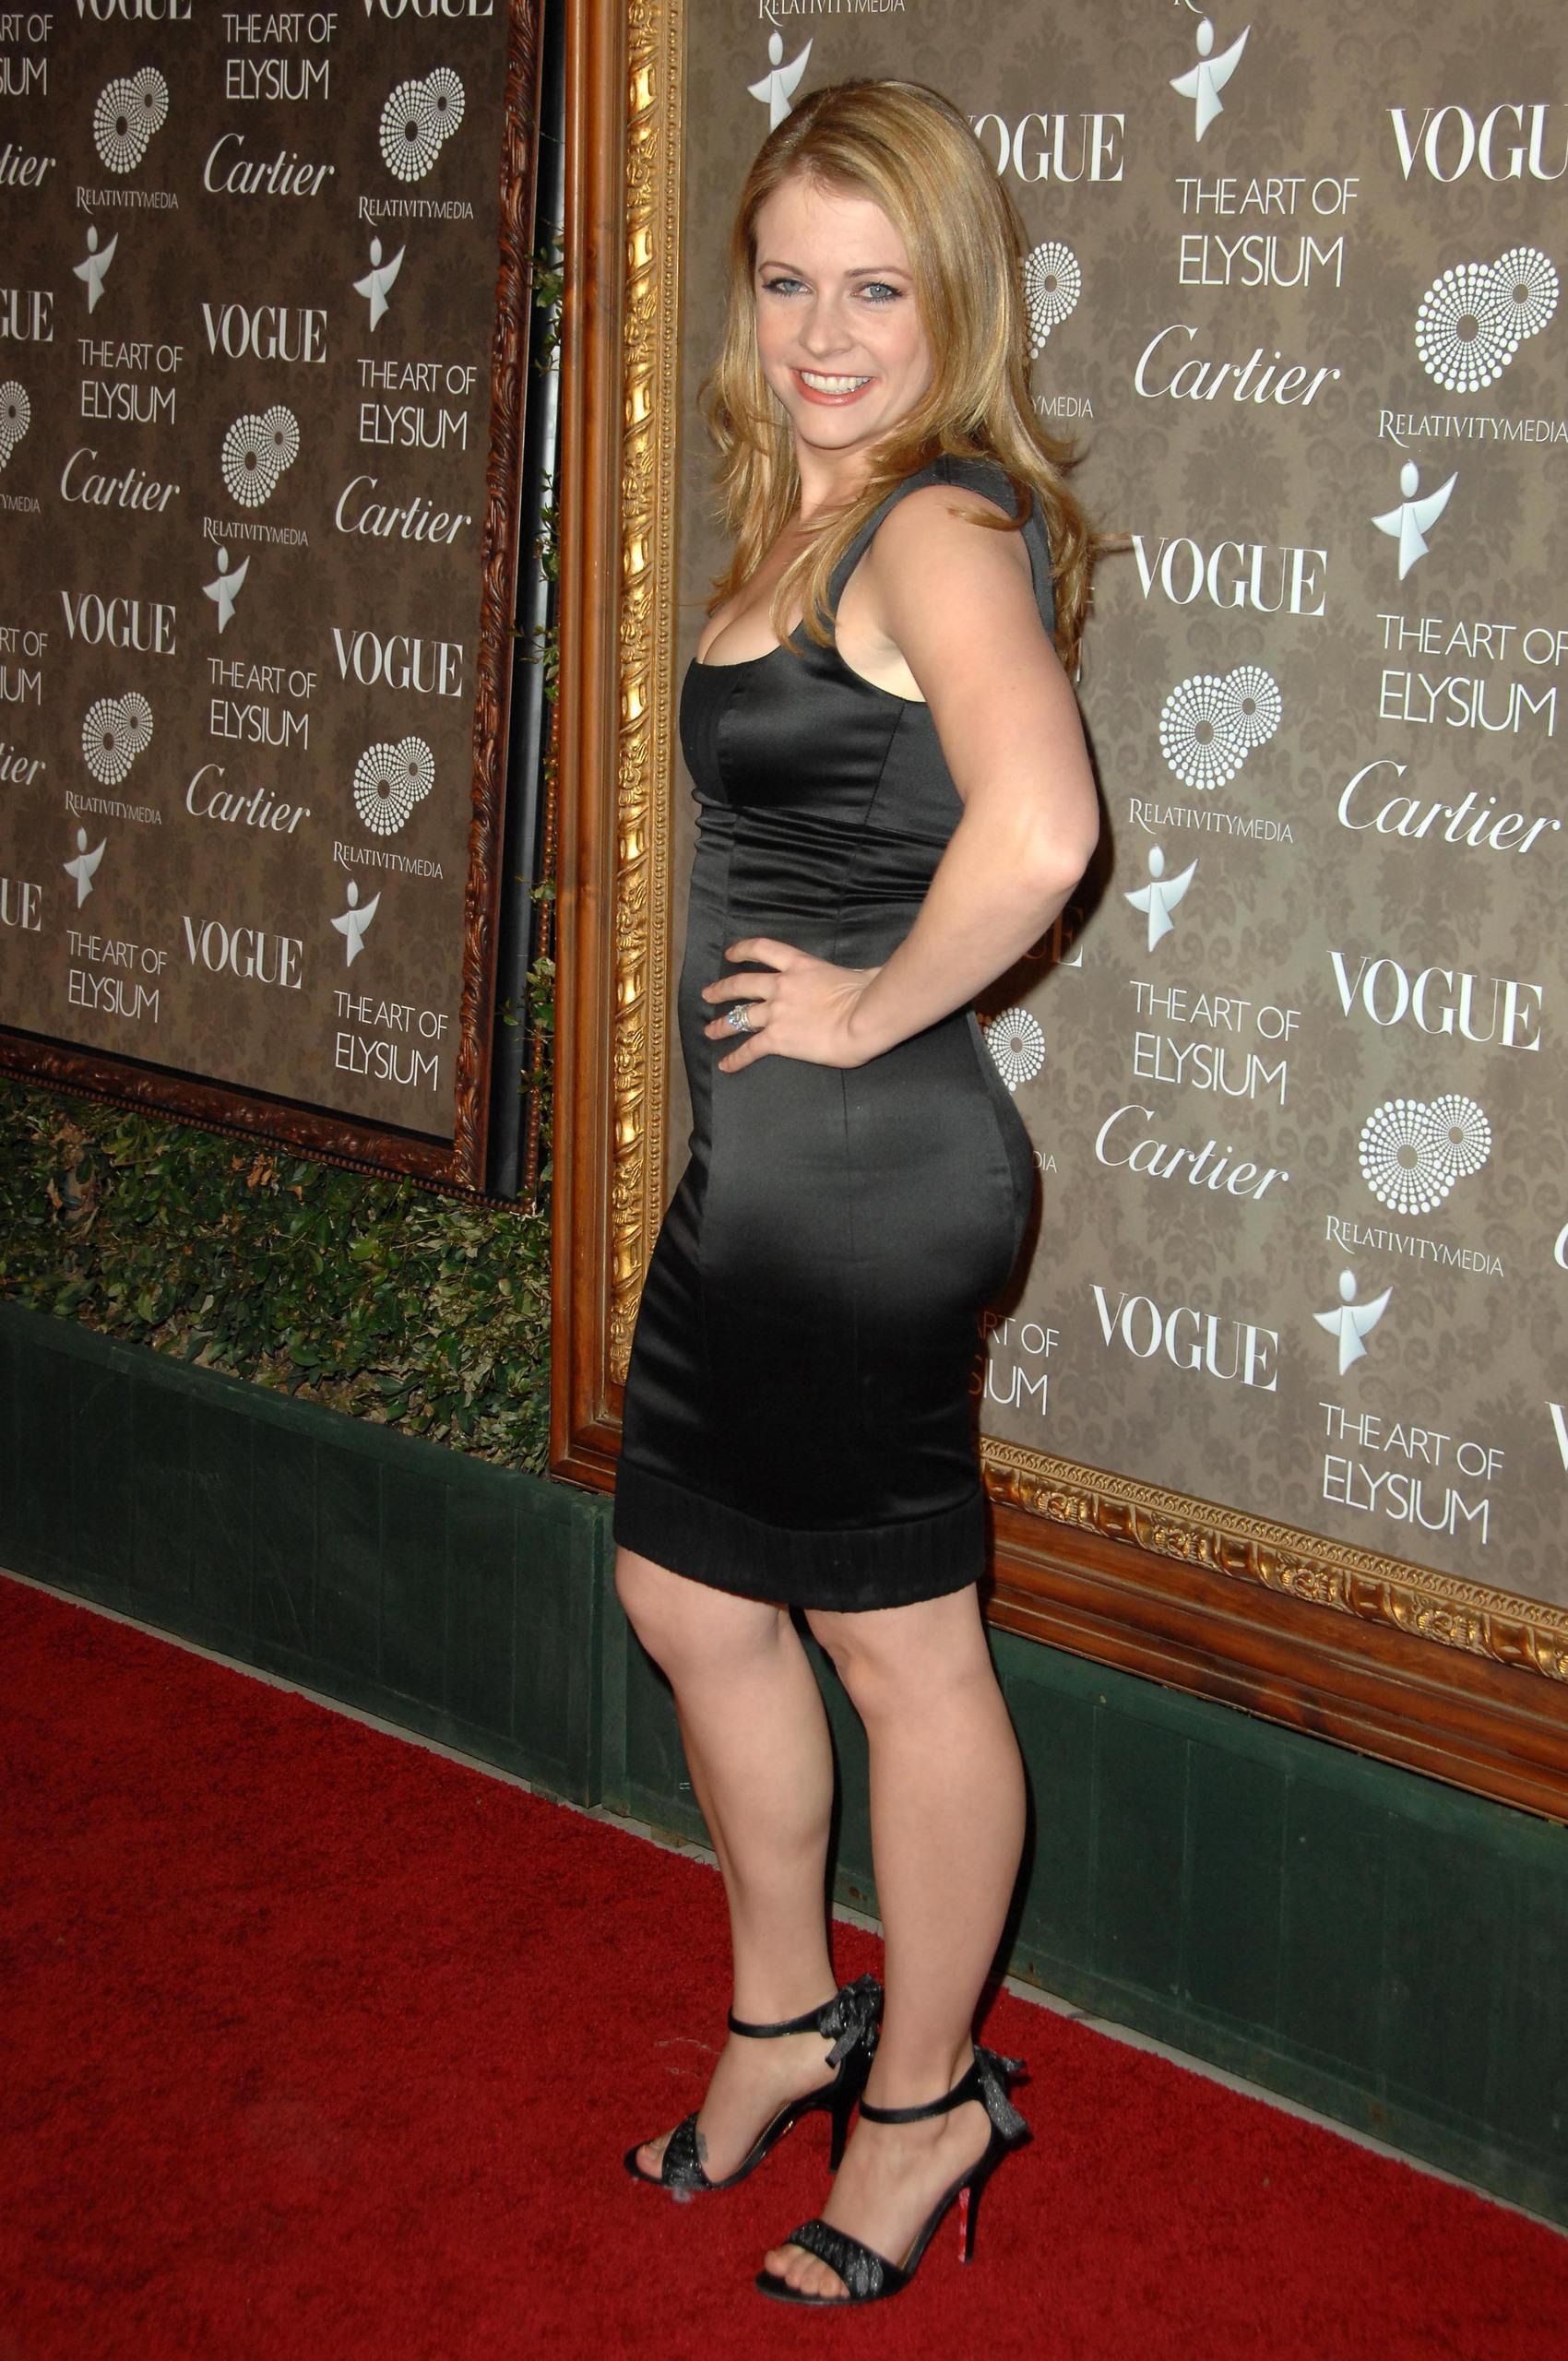 Melissa Monet naked (35 photos), Topless, Paparazzi, Twitter, butt 2006